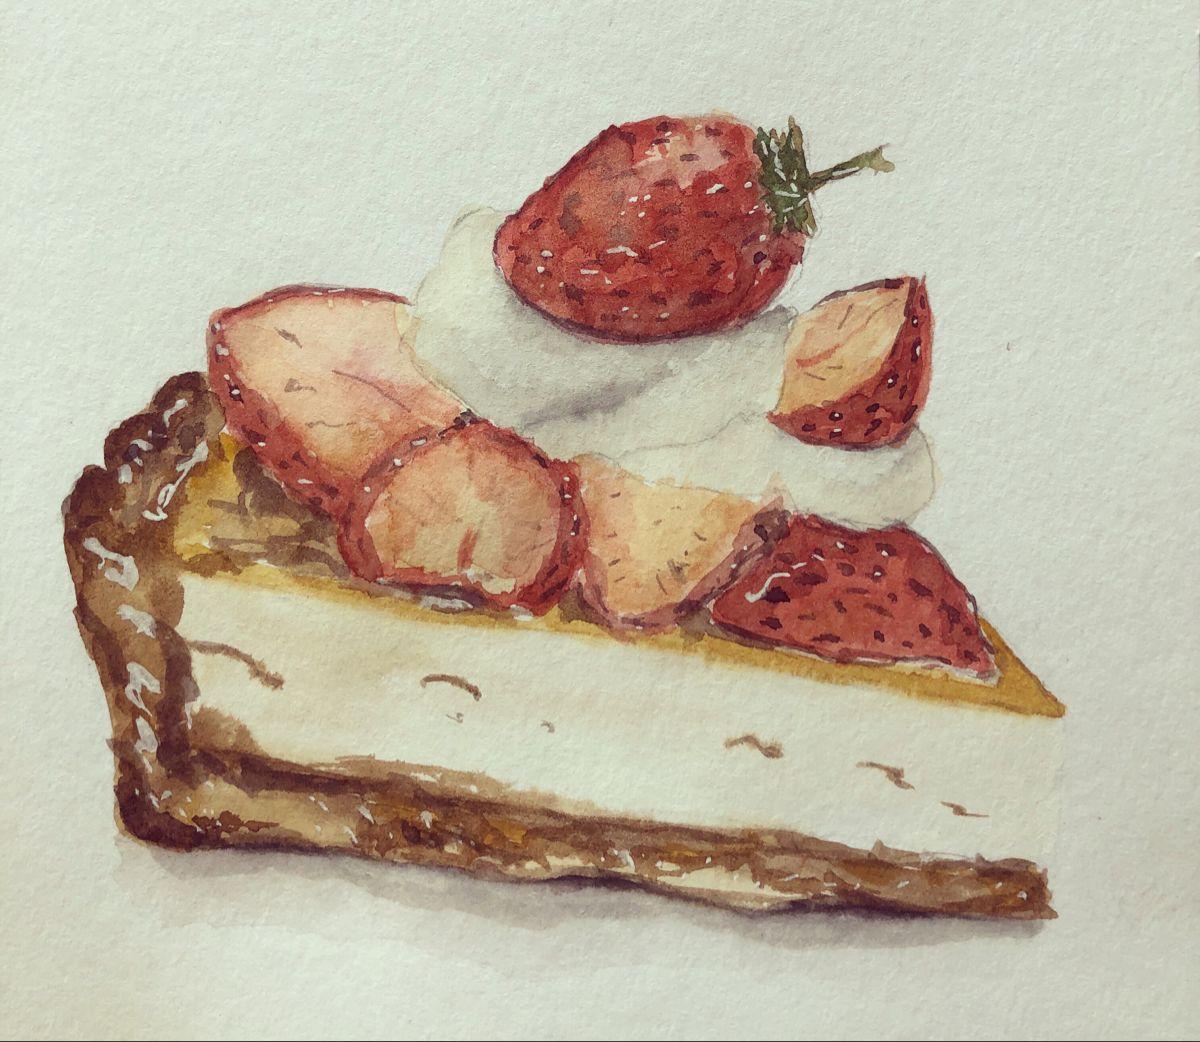 #Cake #watercolor #watercolor #watercolorsketch #sketch #illustration #watercolorpainting #watercolorillustration